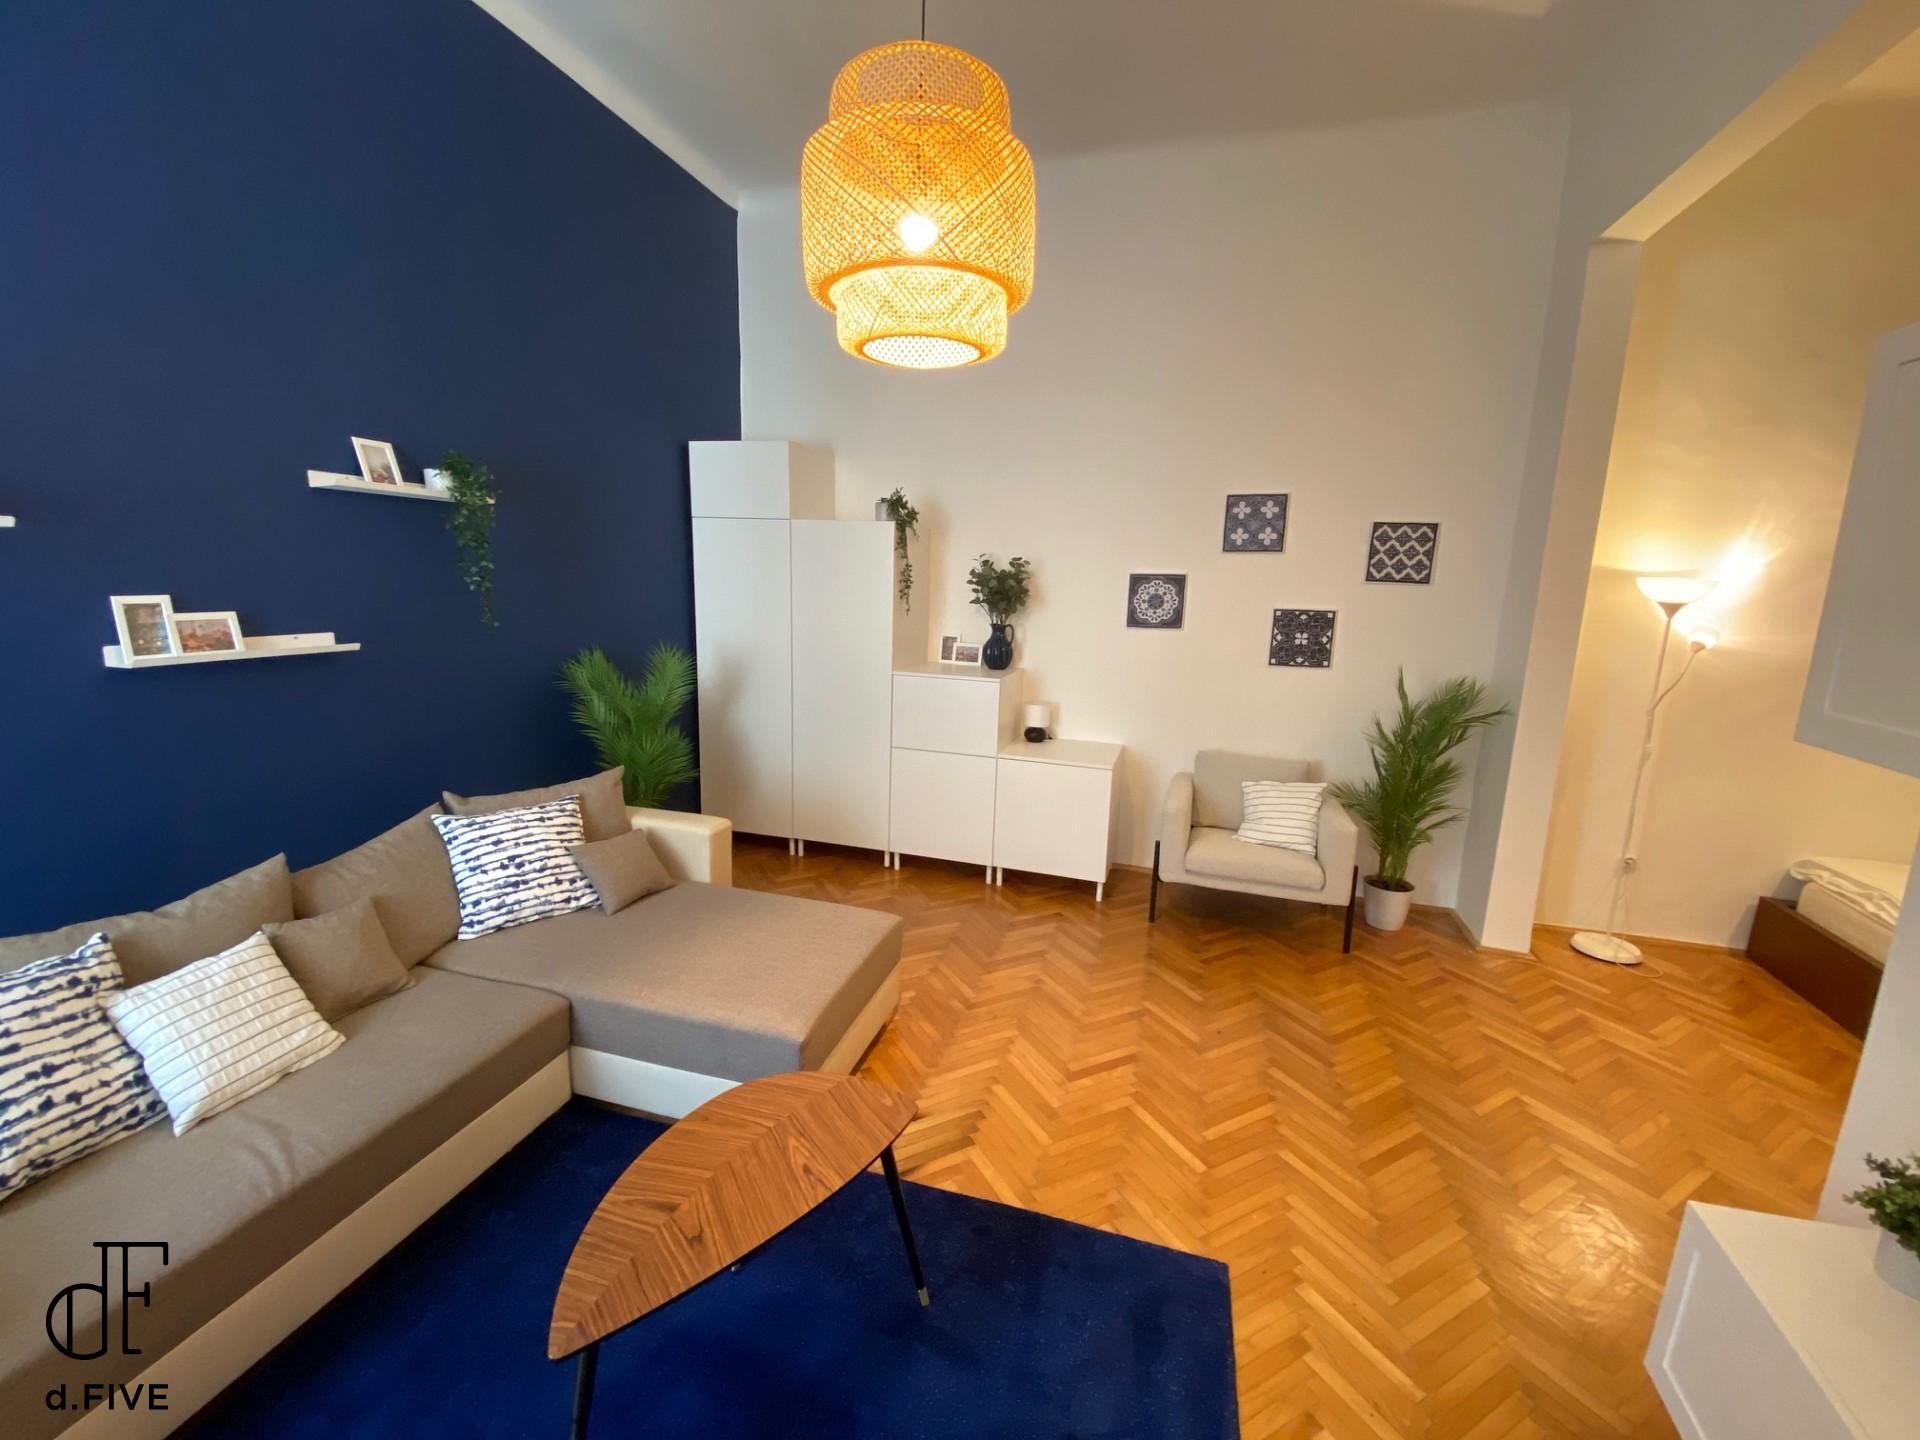 d.Five Eagle Apartment